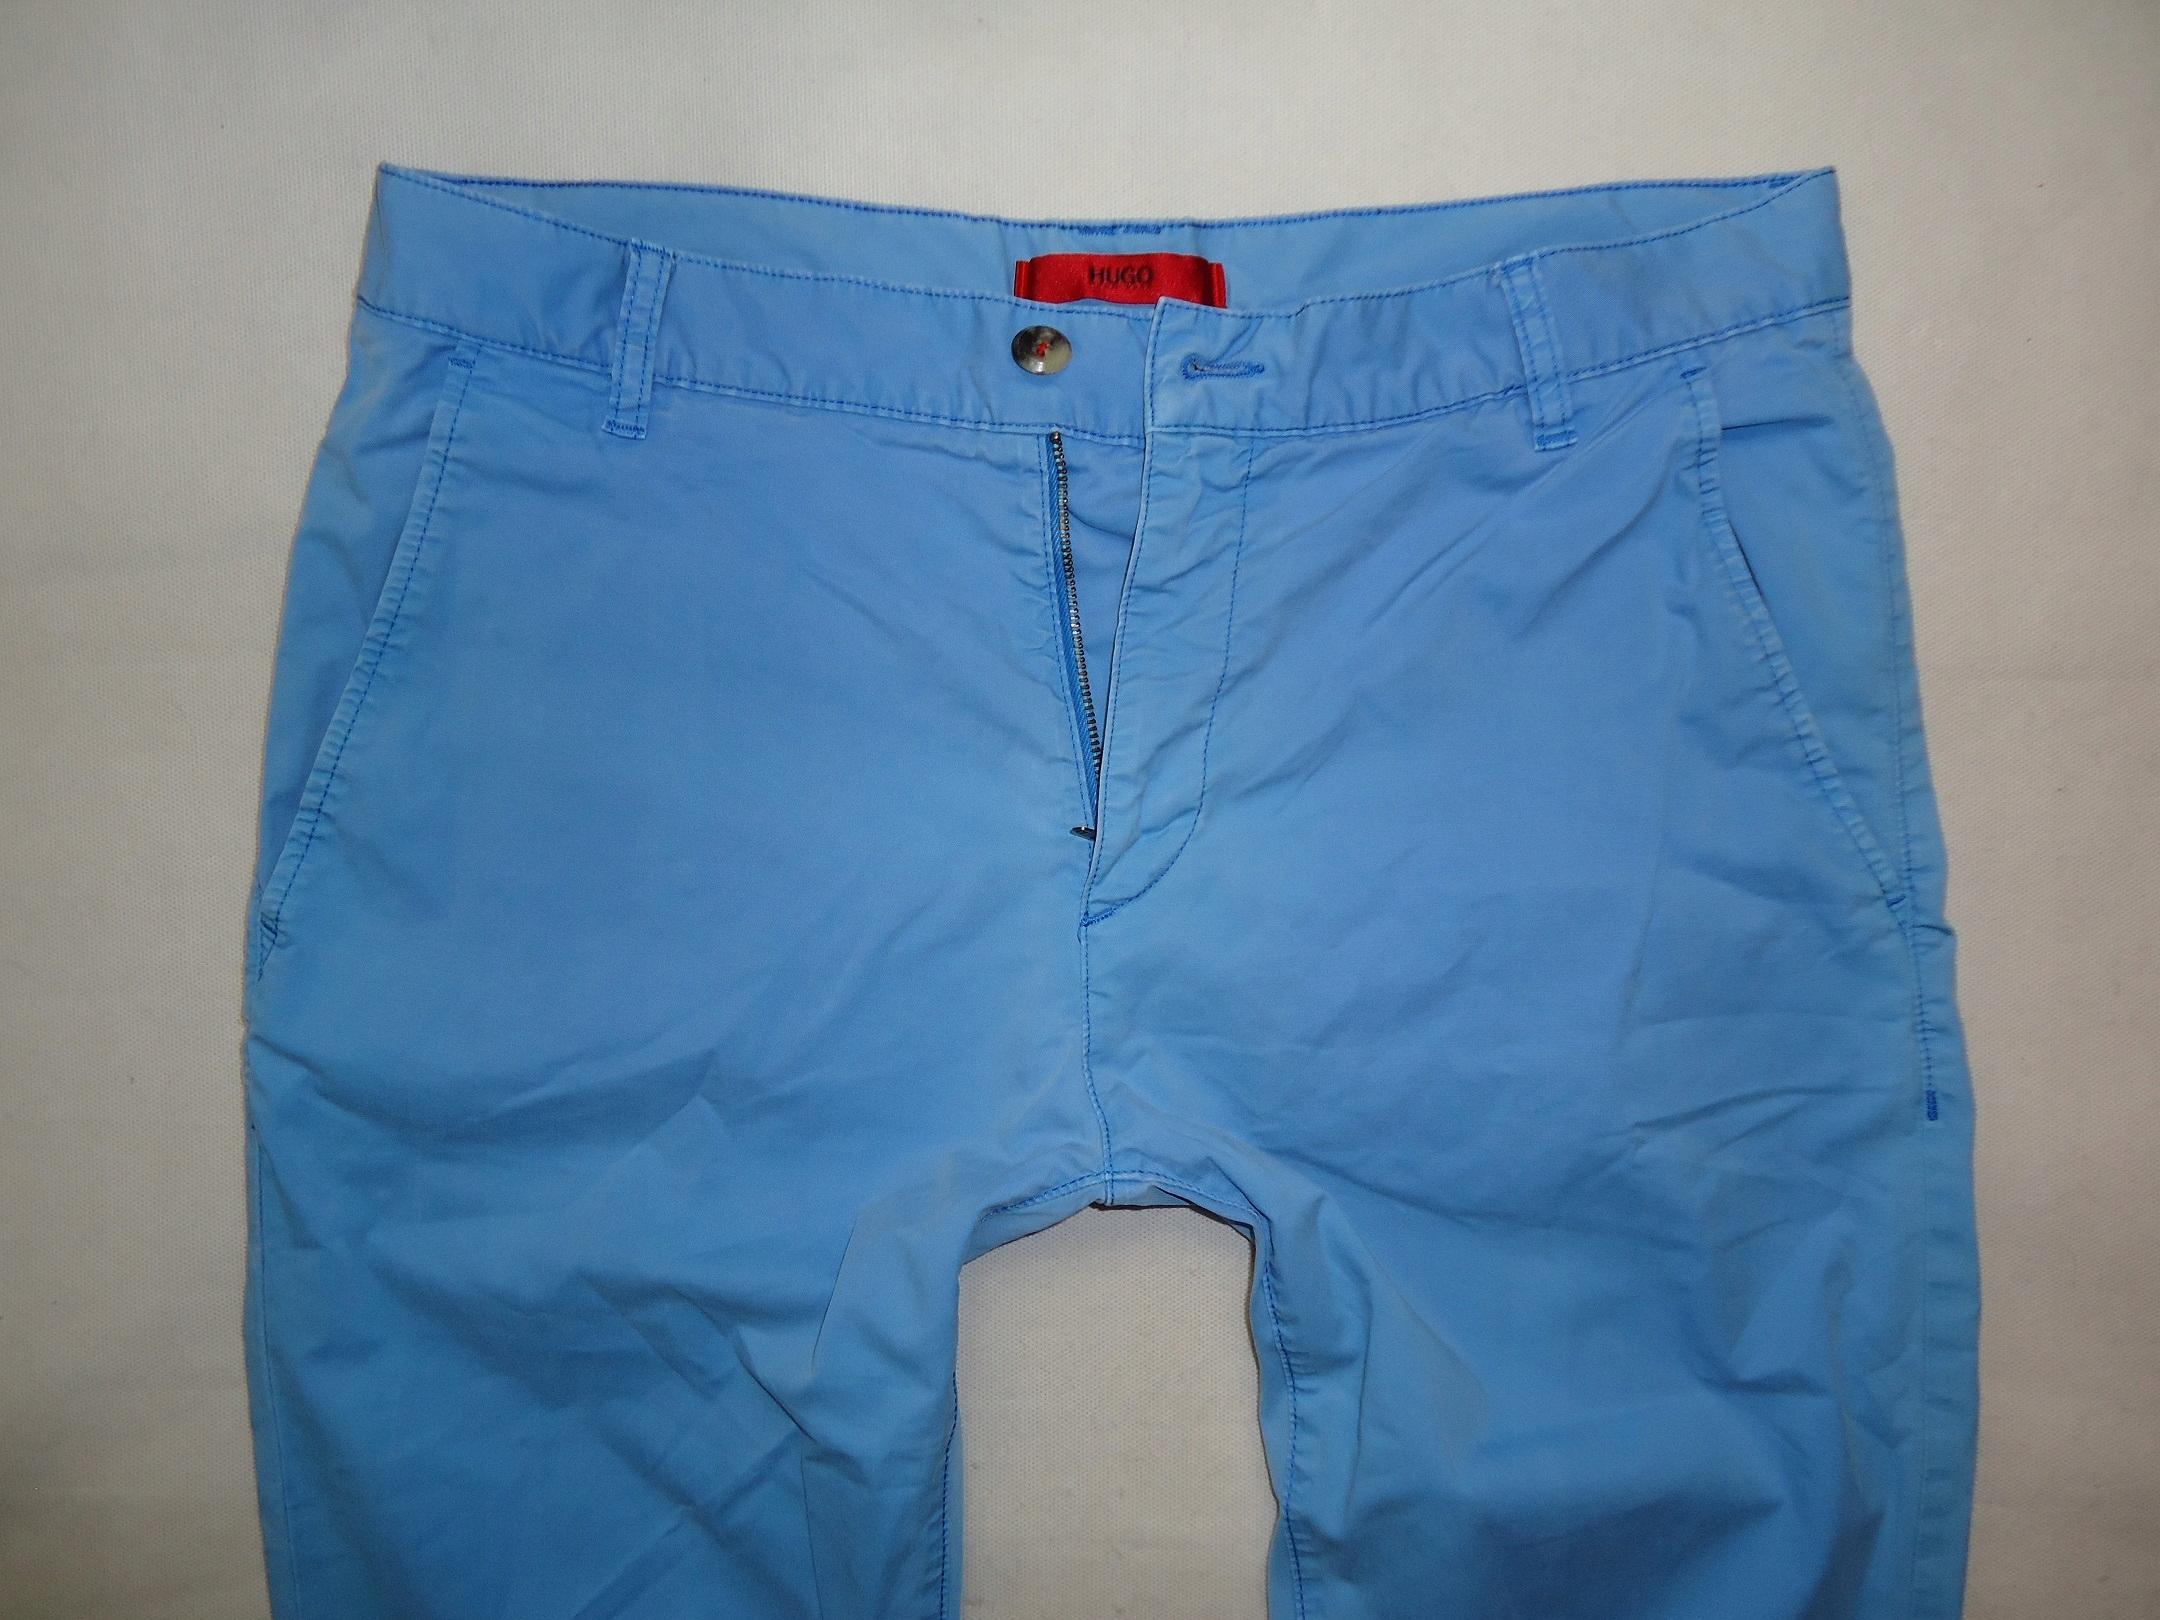 Spodnie HUGO BOSS Regular 32/32 W32 L32 Red Label